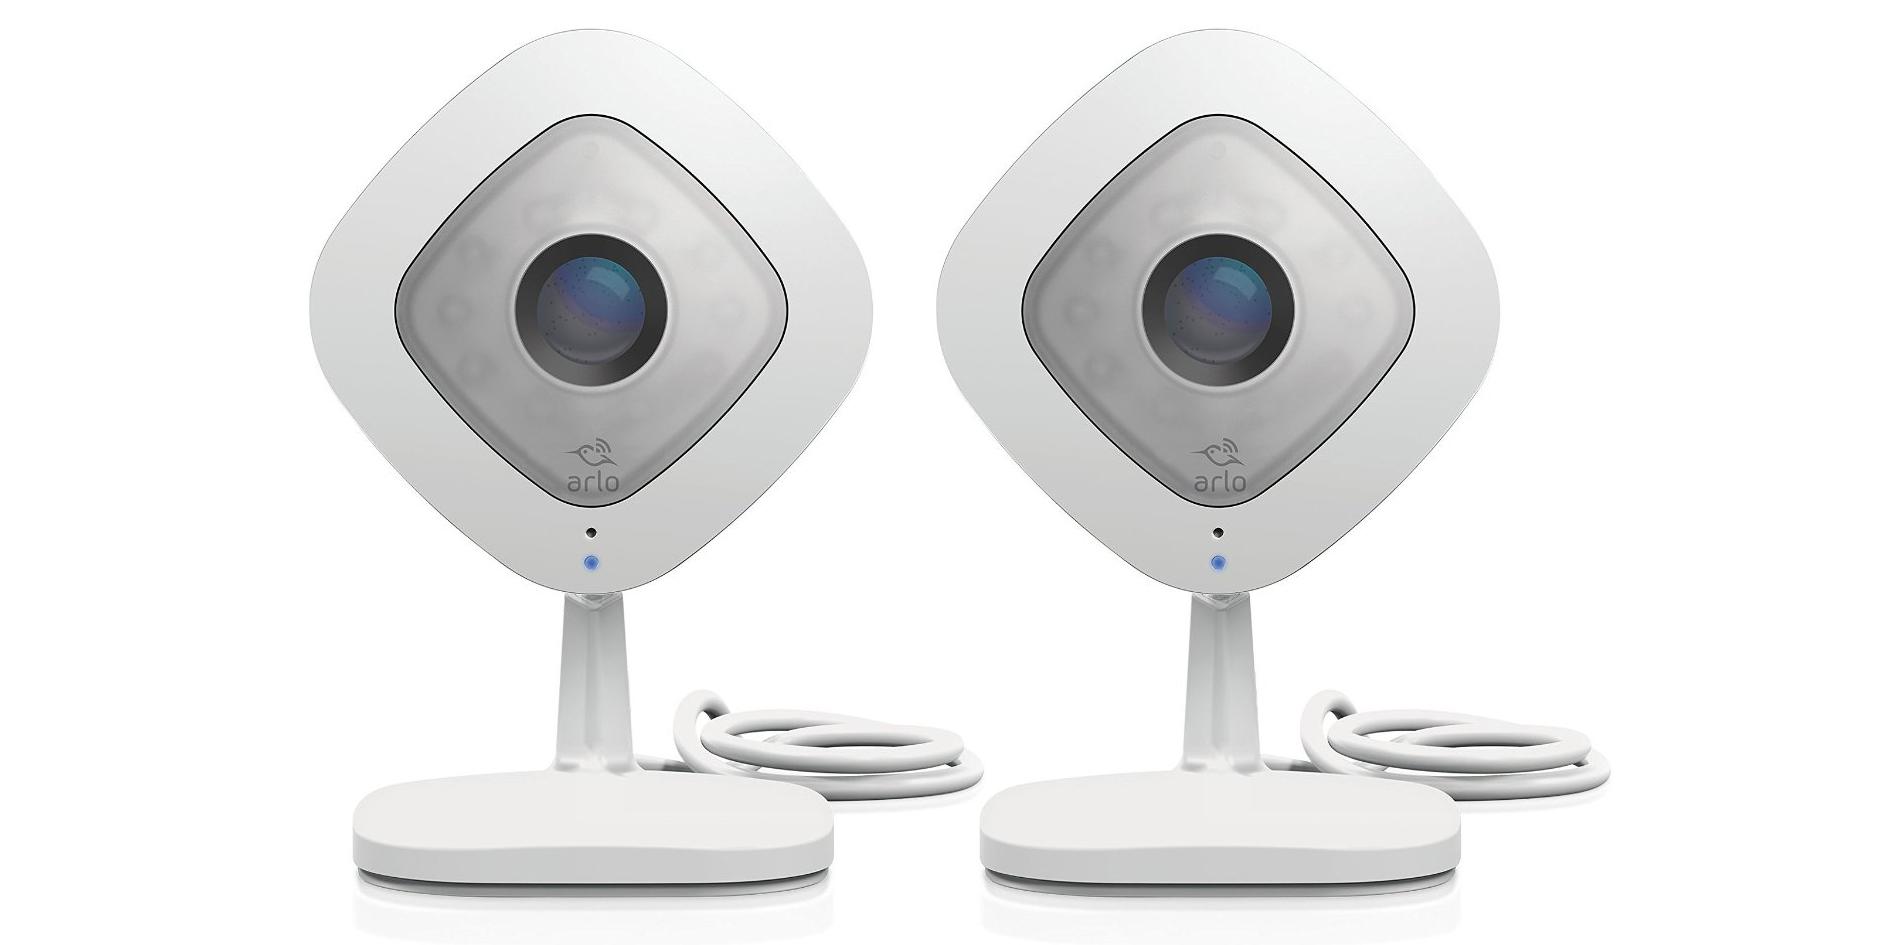 netgear-arlo-security-cameras